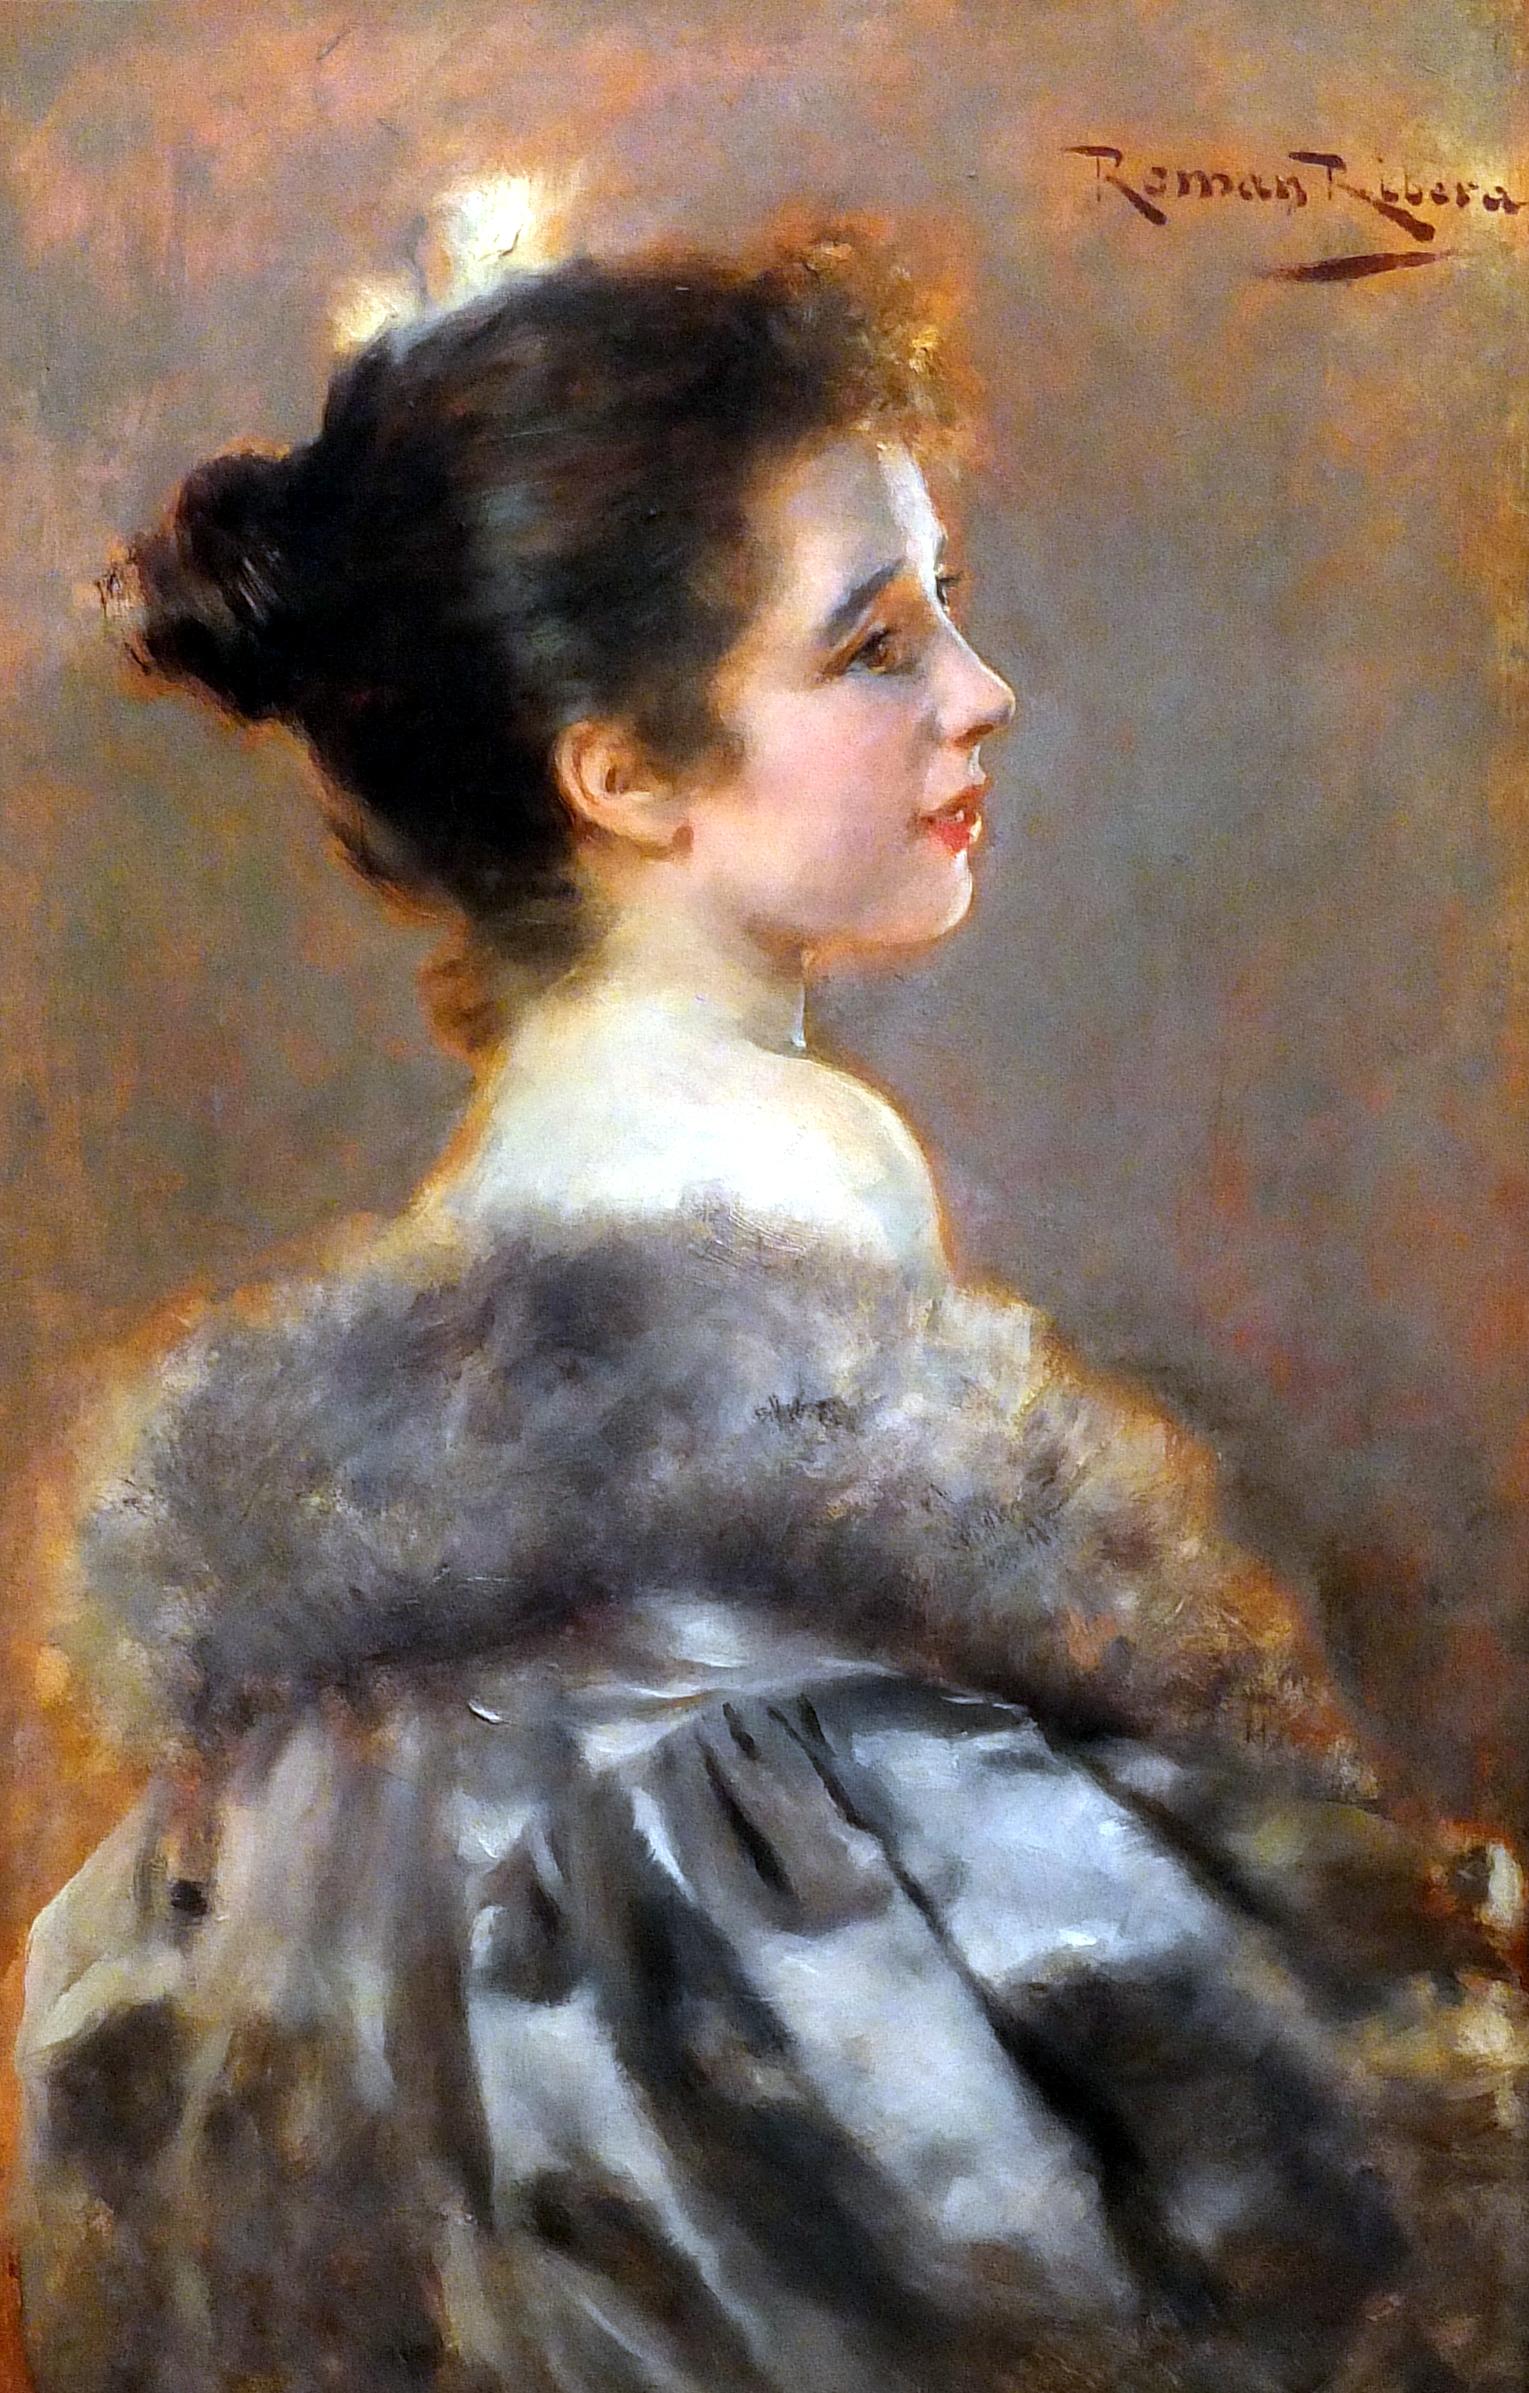 РОМАН РИБЕРА СИРЕРА ( РОМА РИБЕРА) (ROMАN RIBERA CIRERA),1848-1935. ИСПАНИЯ.